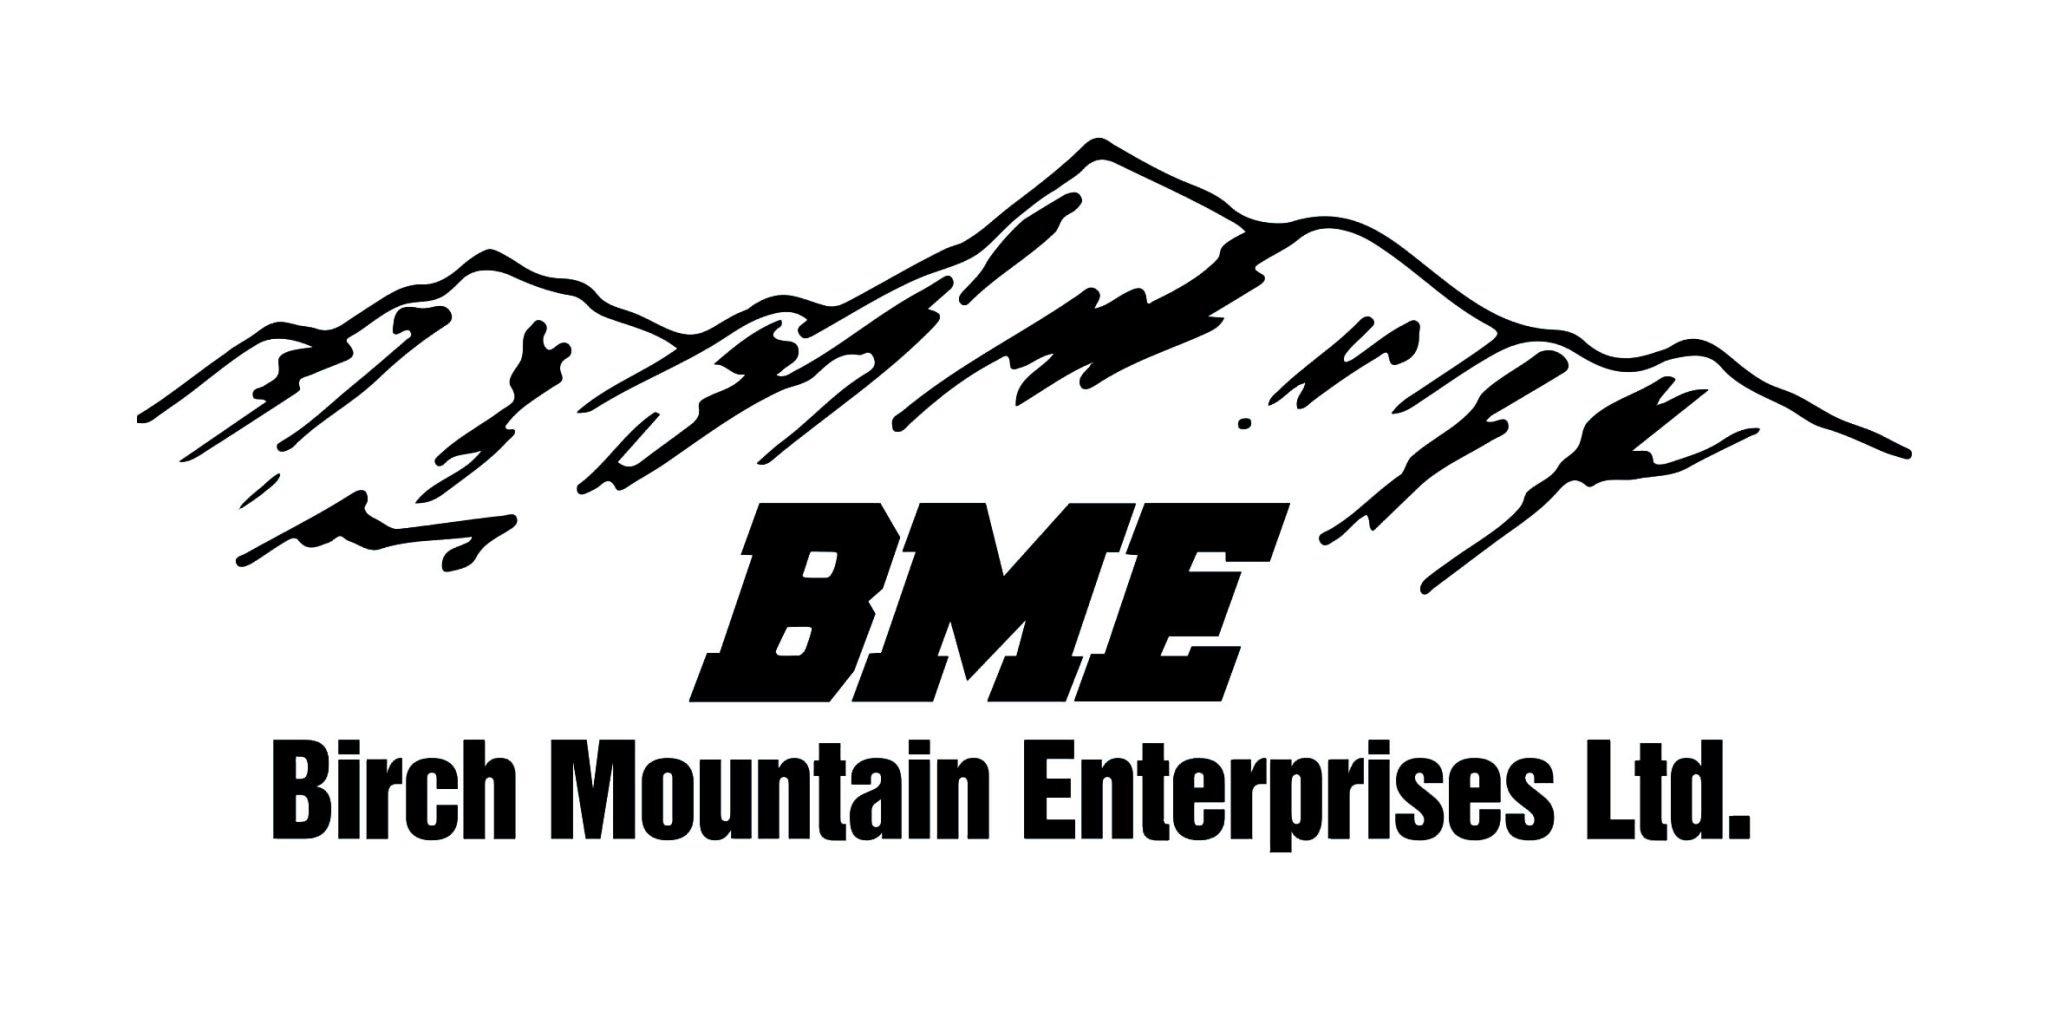 Birch Mountain Enterprises